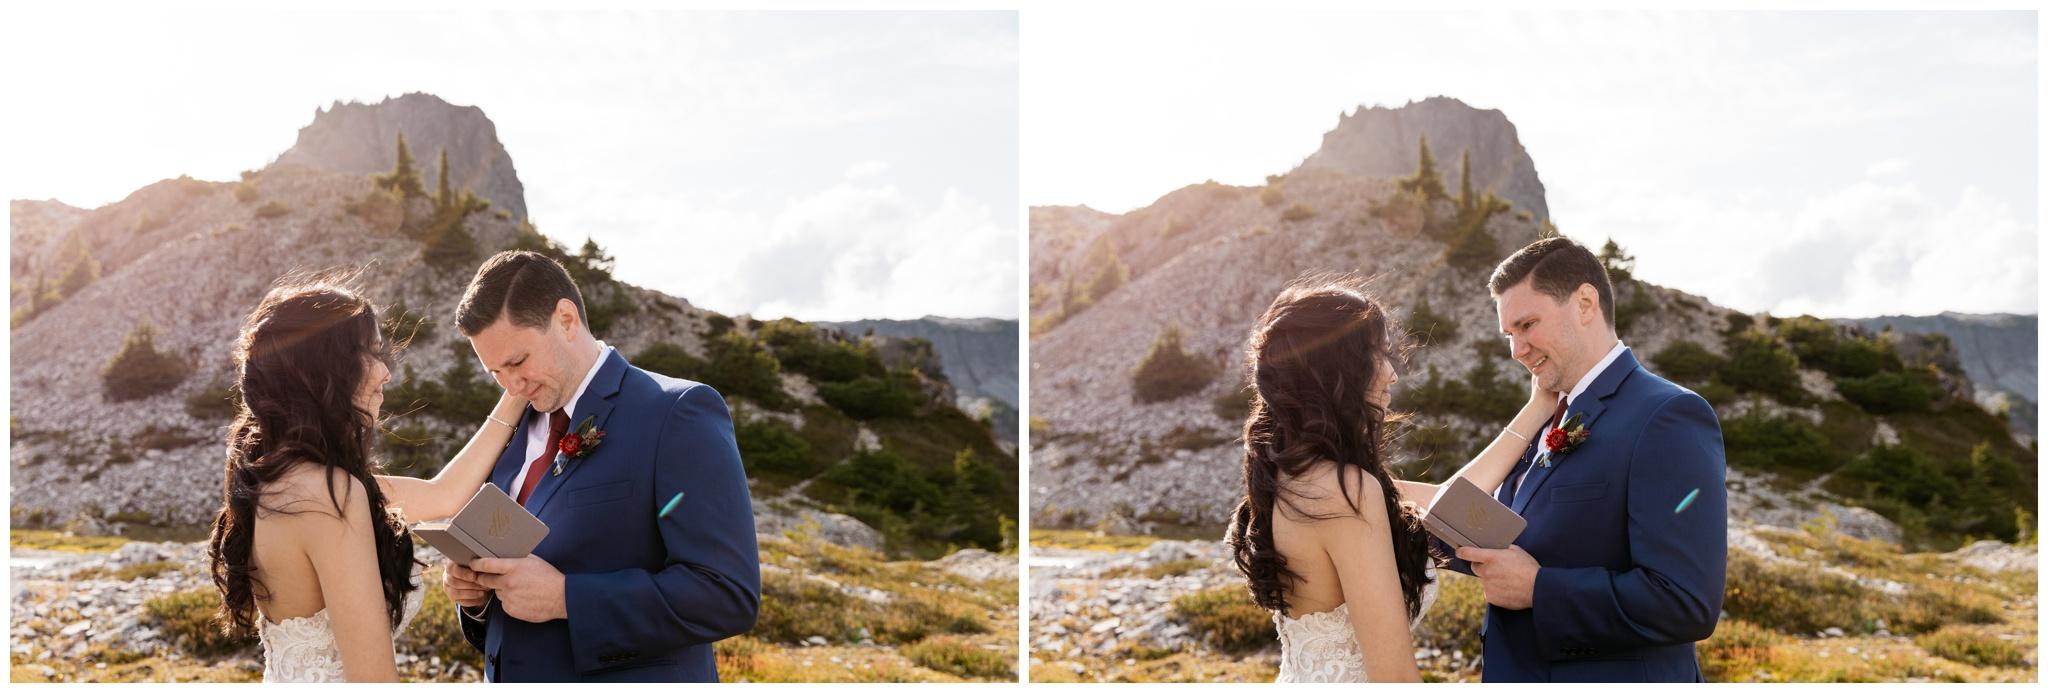 Fall Elopement at Artist Point Mt. Baker Washington with Wedding and Elopement Photographer Brittney Hyatt and Wedding Planner Emily Aitken Events